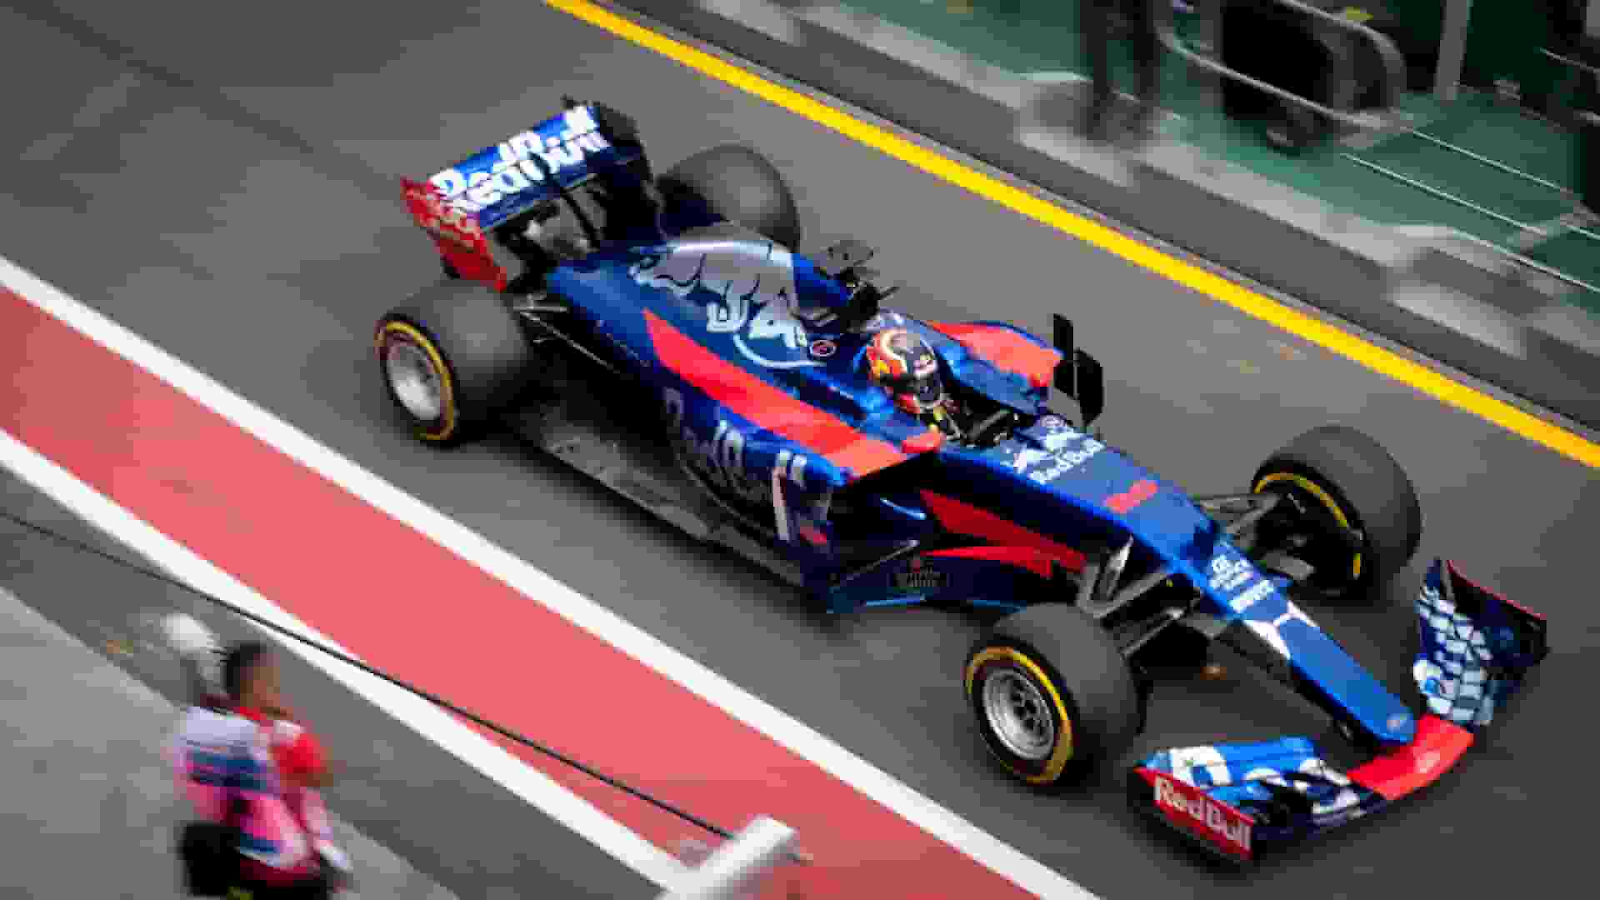 race car photo in JPEG (20.7kB)